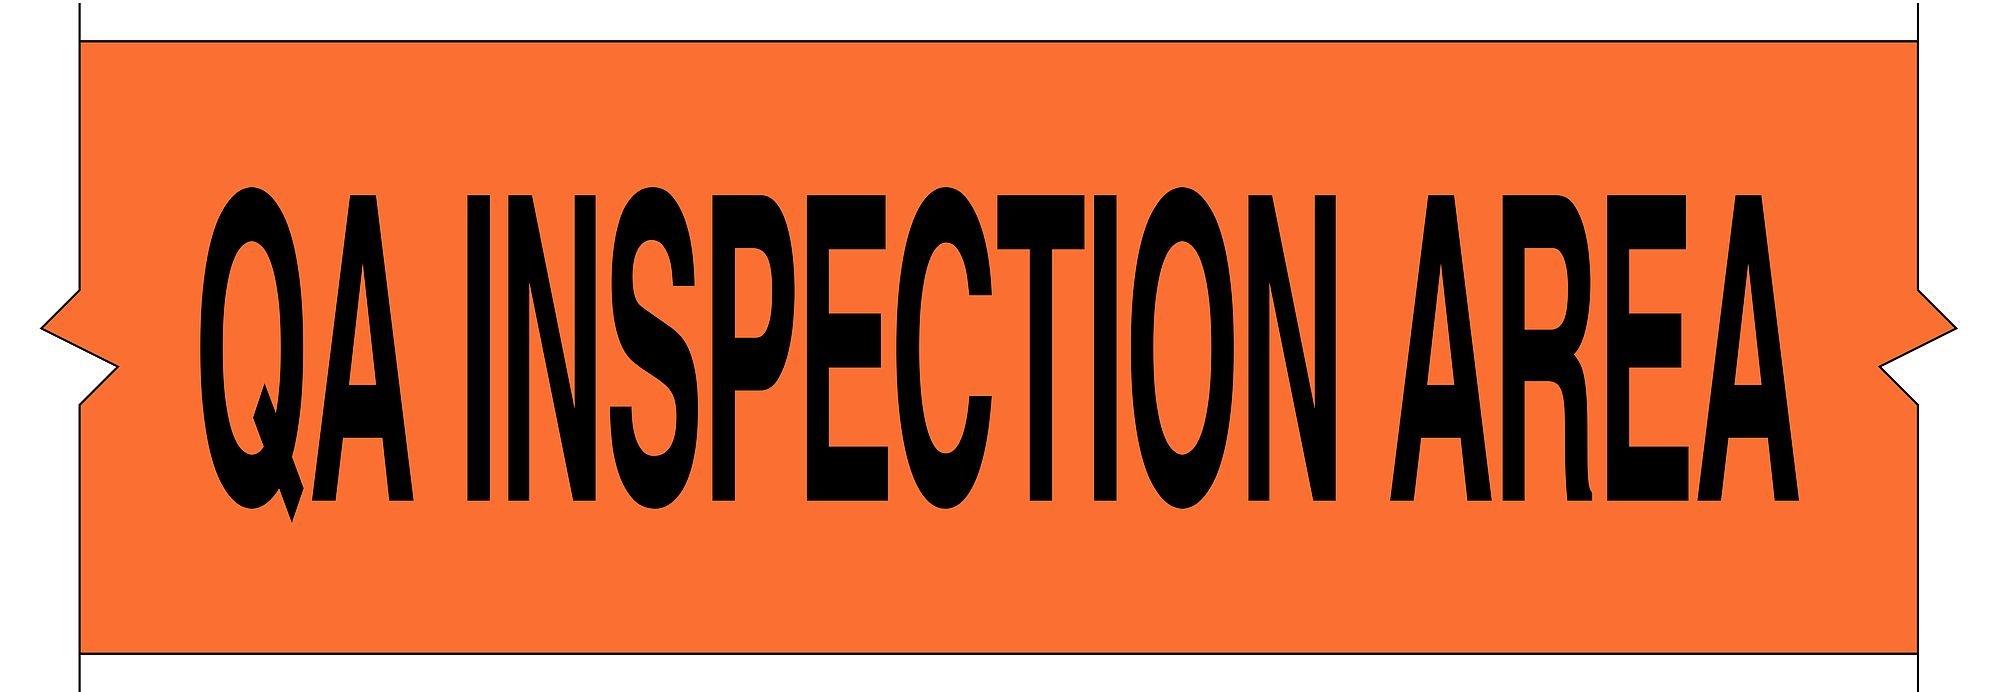 Brady 121366 Toughstripe QA Inspection Area, 4'' Height x 100' Length, Orange Floor Tape